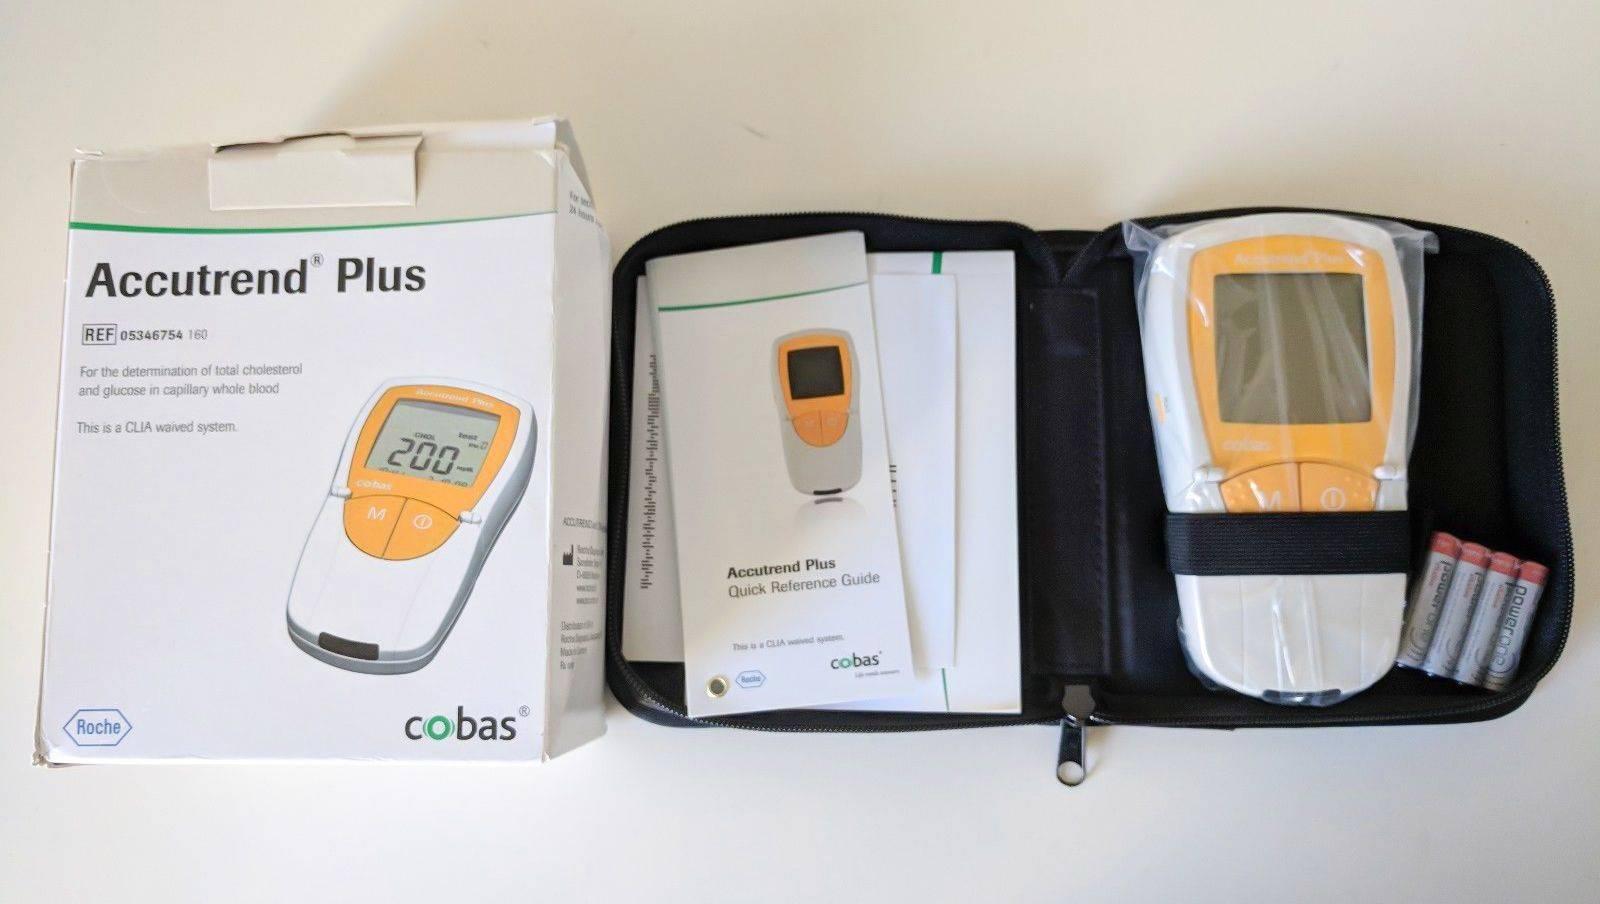 измерение холестерина на дому